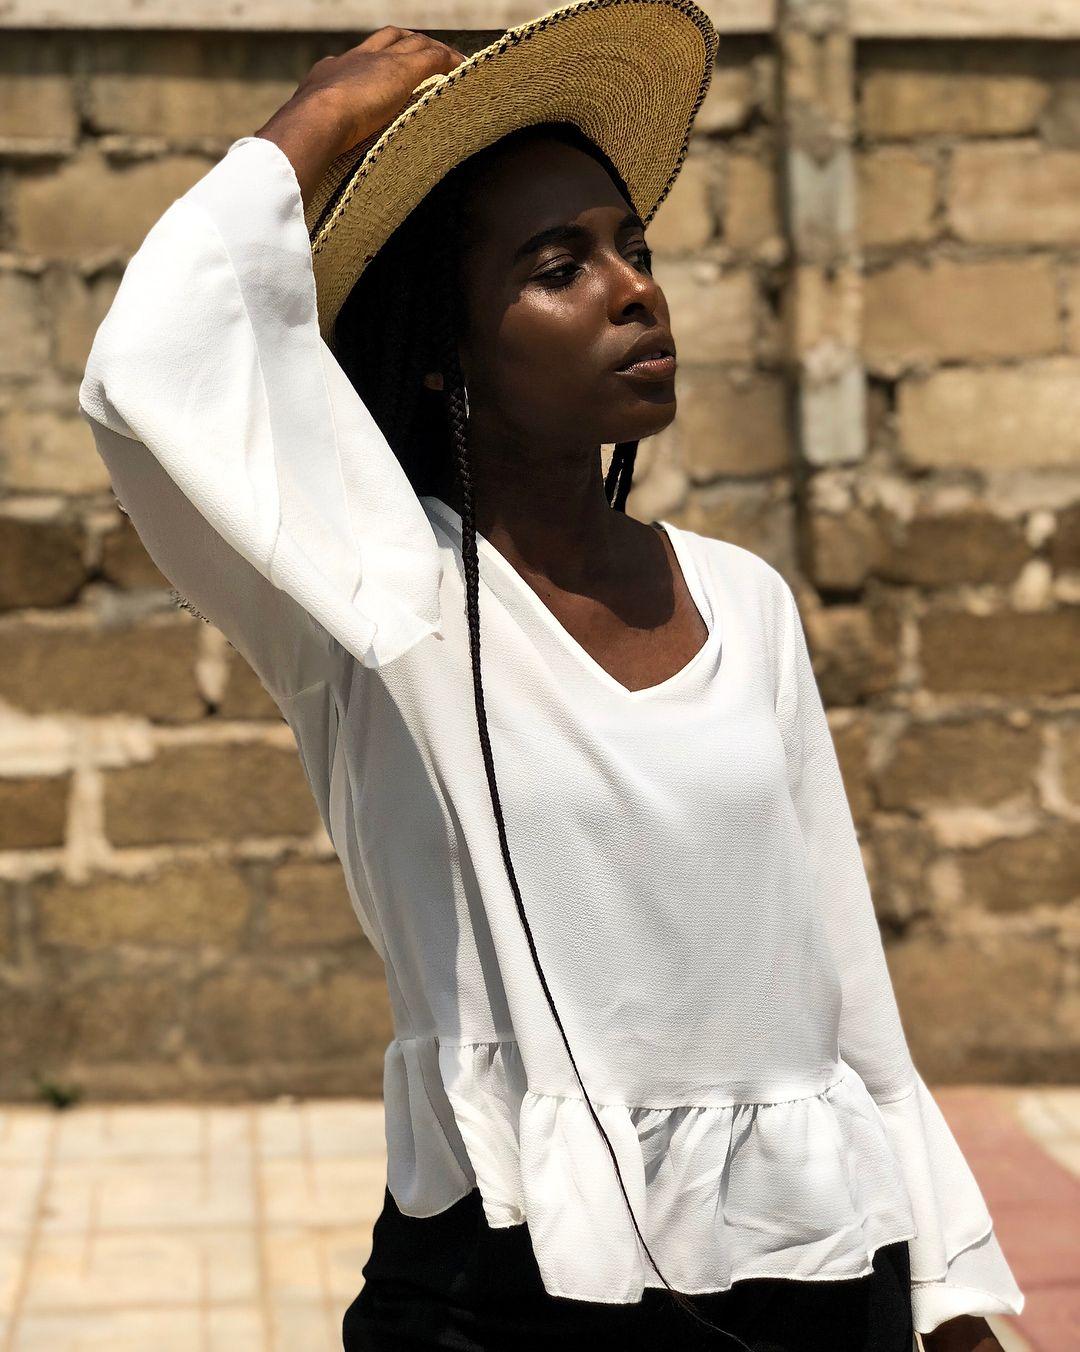 ce1671b1 L GILLIAN OKYERE (@thepurpleclassics) on Instagram: straw hat. Dark skin. Black  Women. Sun-kissed. Beauty.